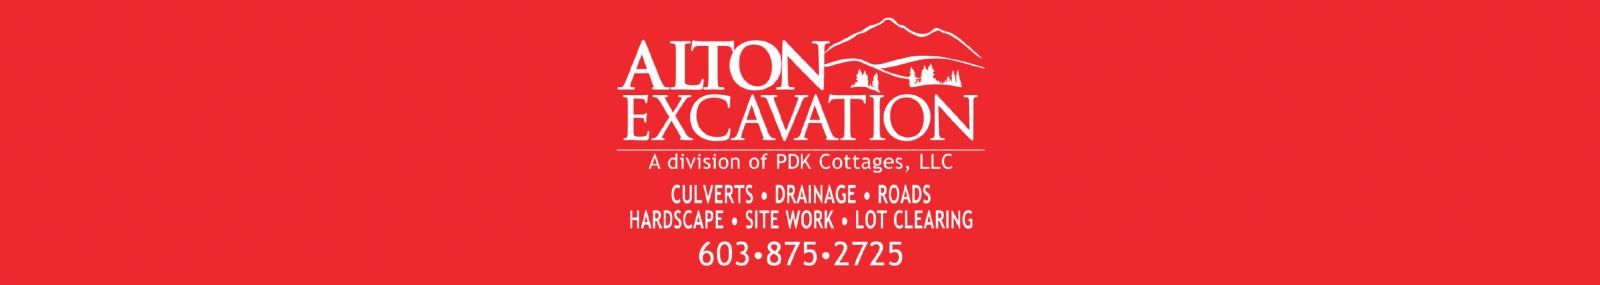 Alton Excavation